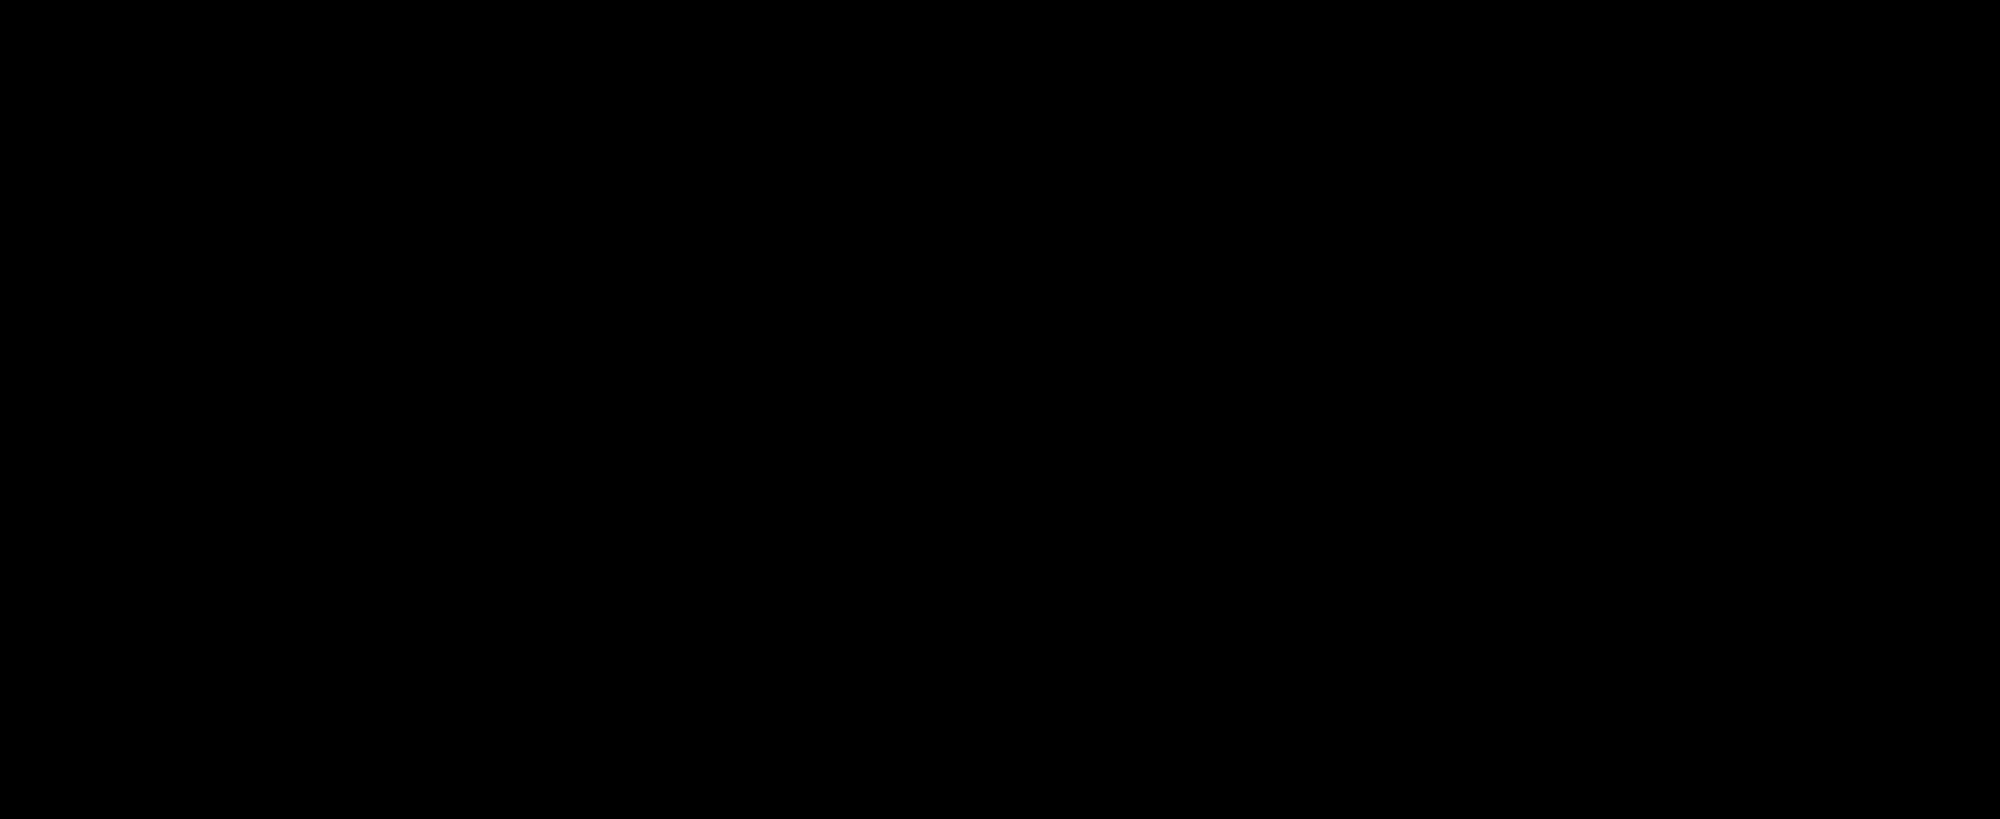 Clipart arrow pointing left.